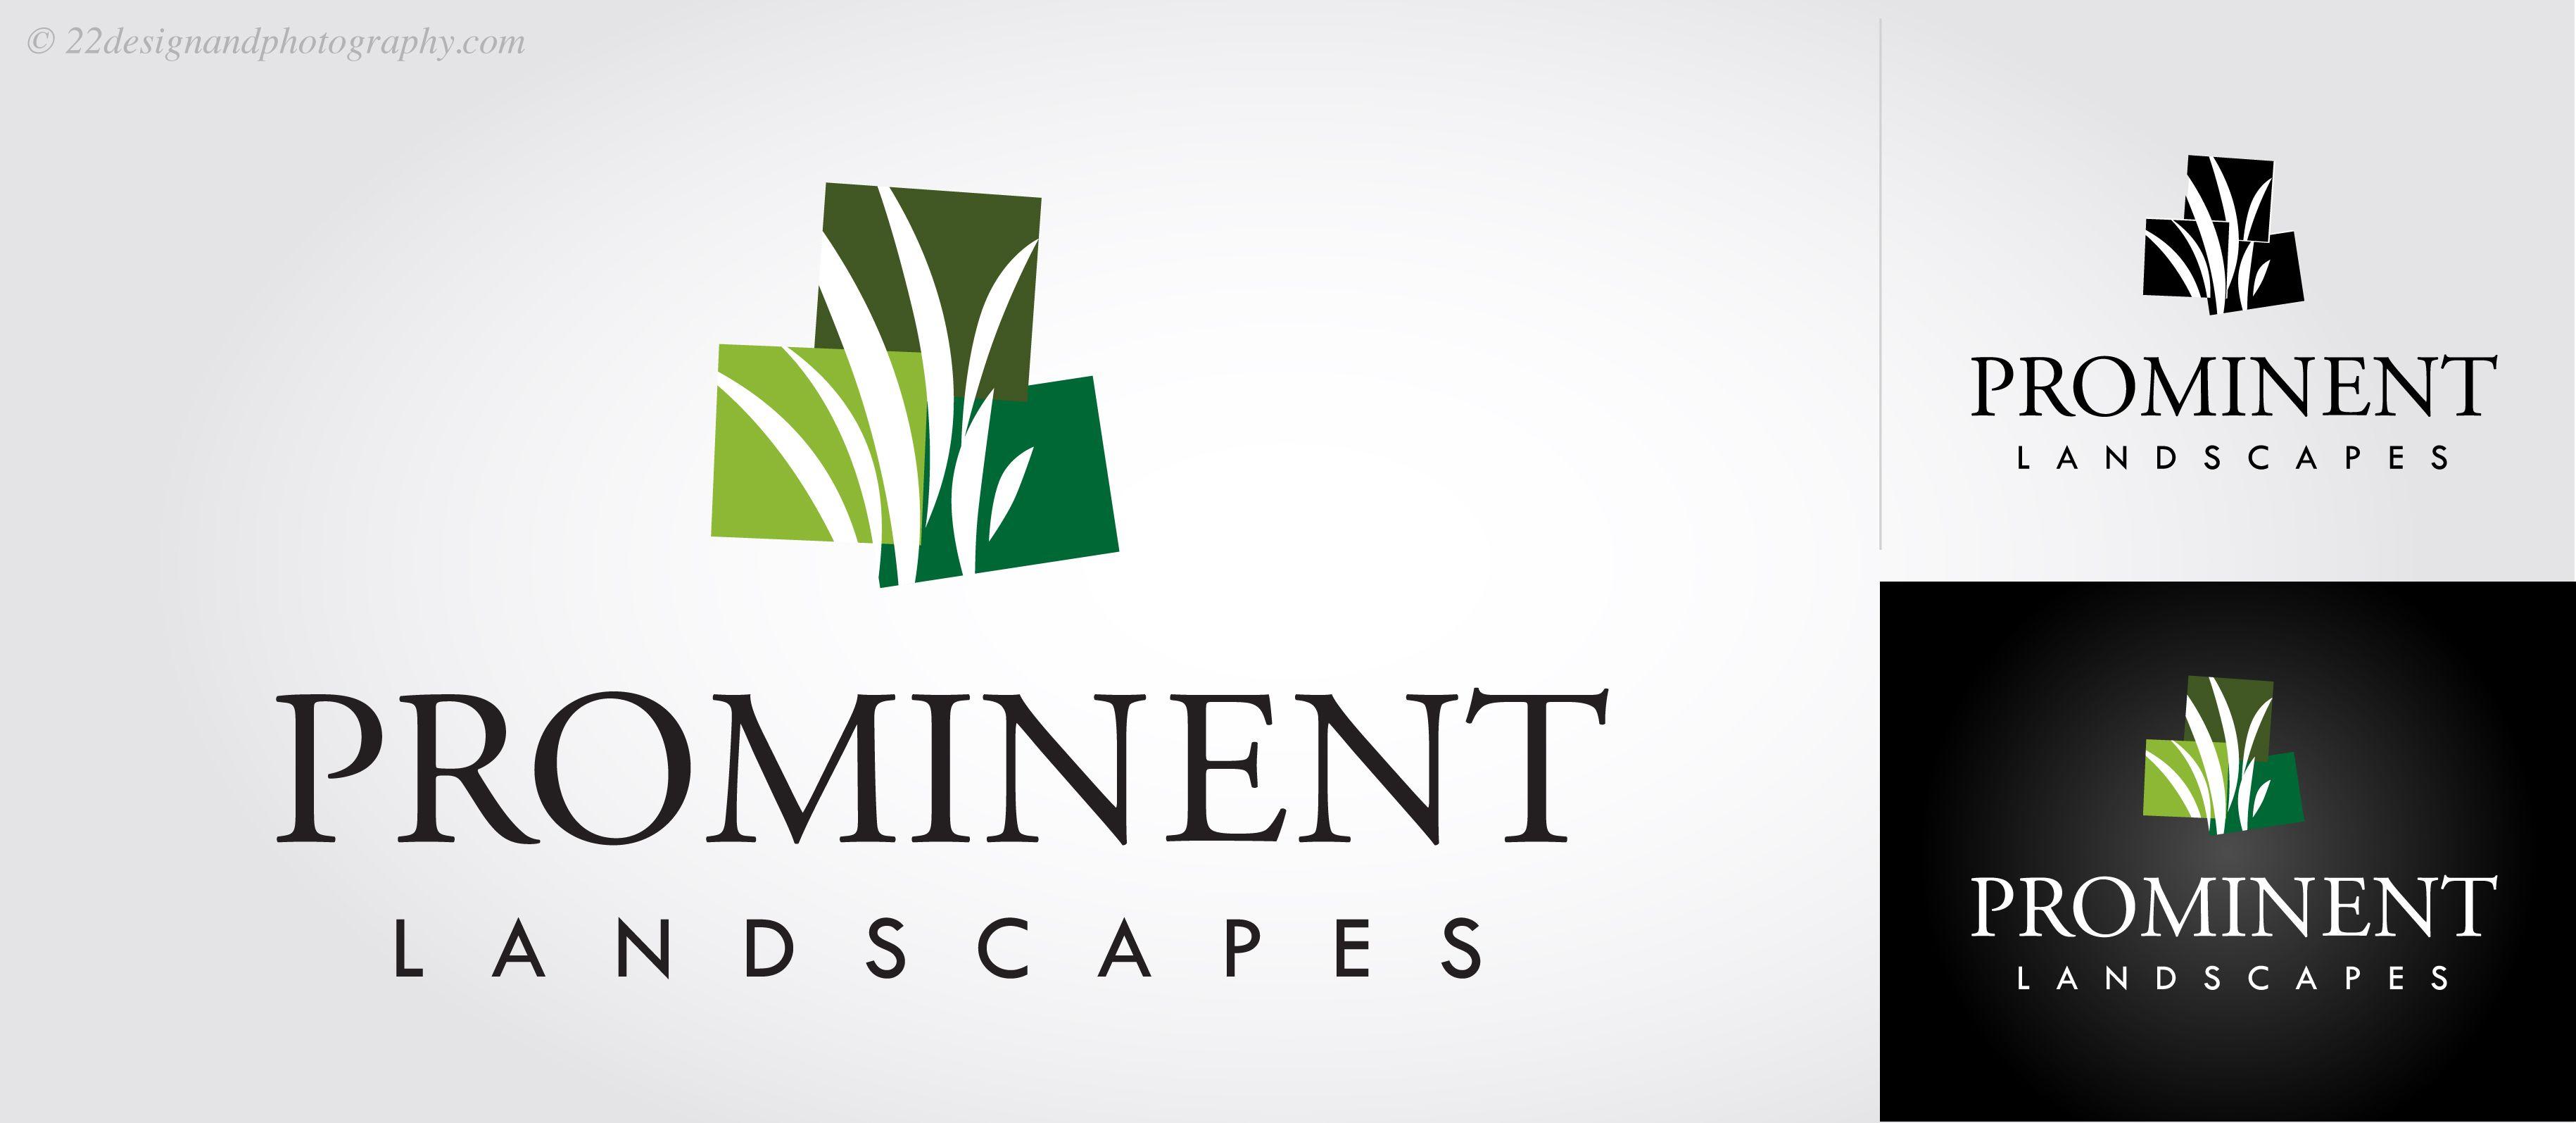 landscape design company logos | bathroom design 2017-2018 ...